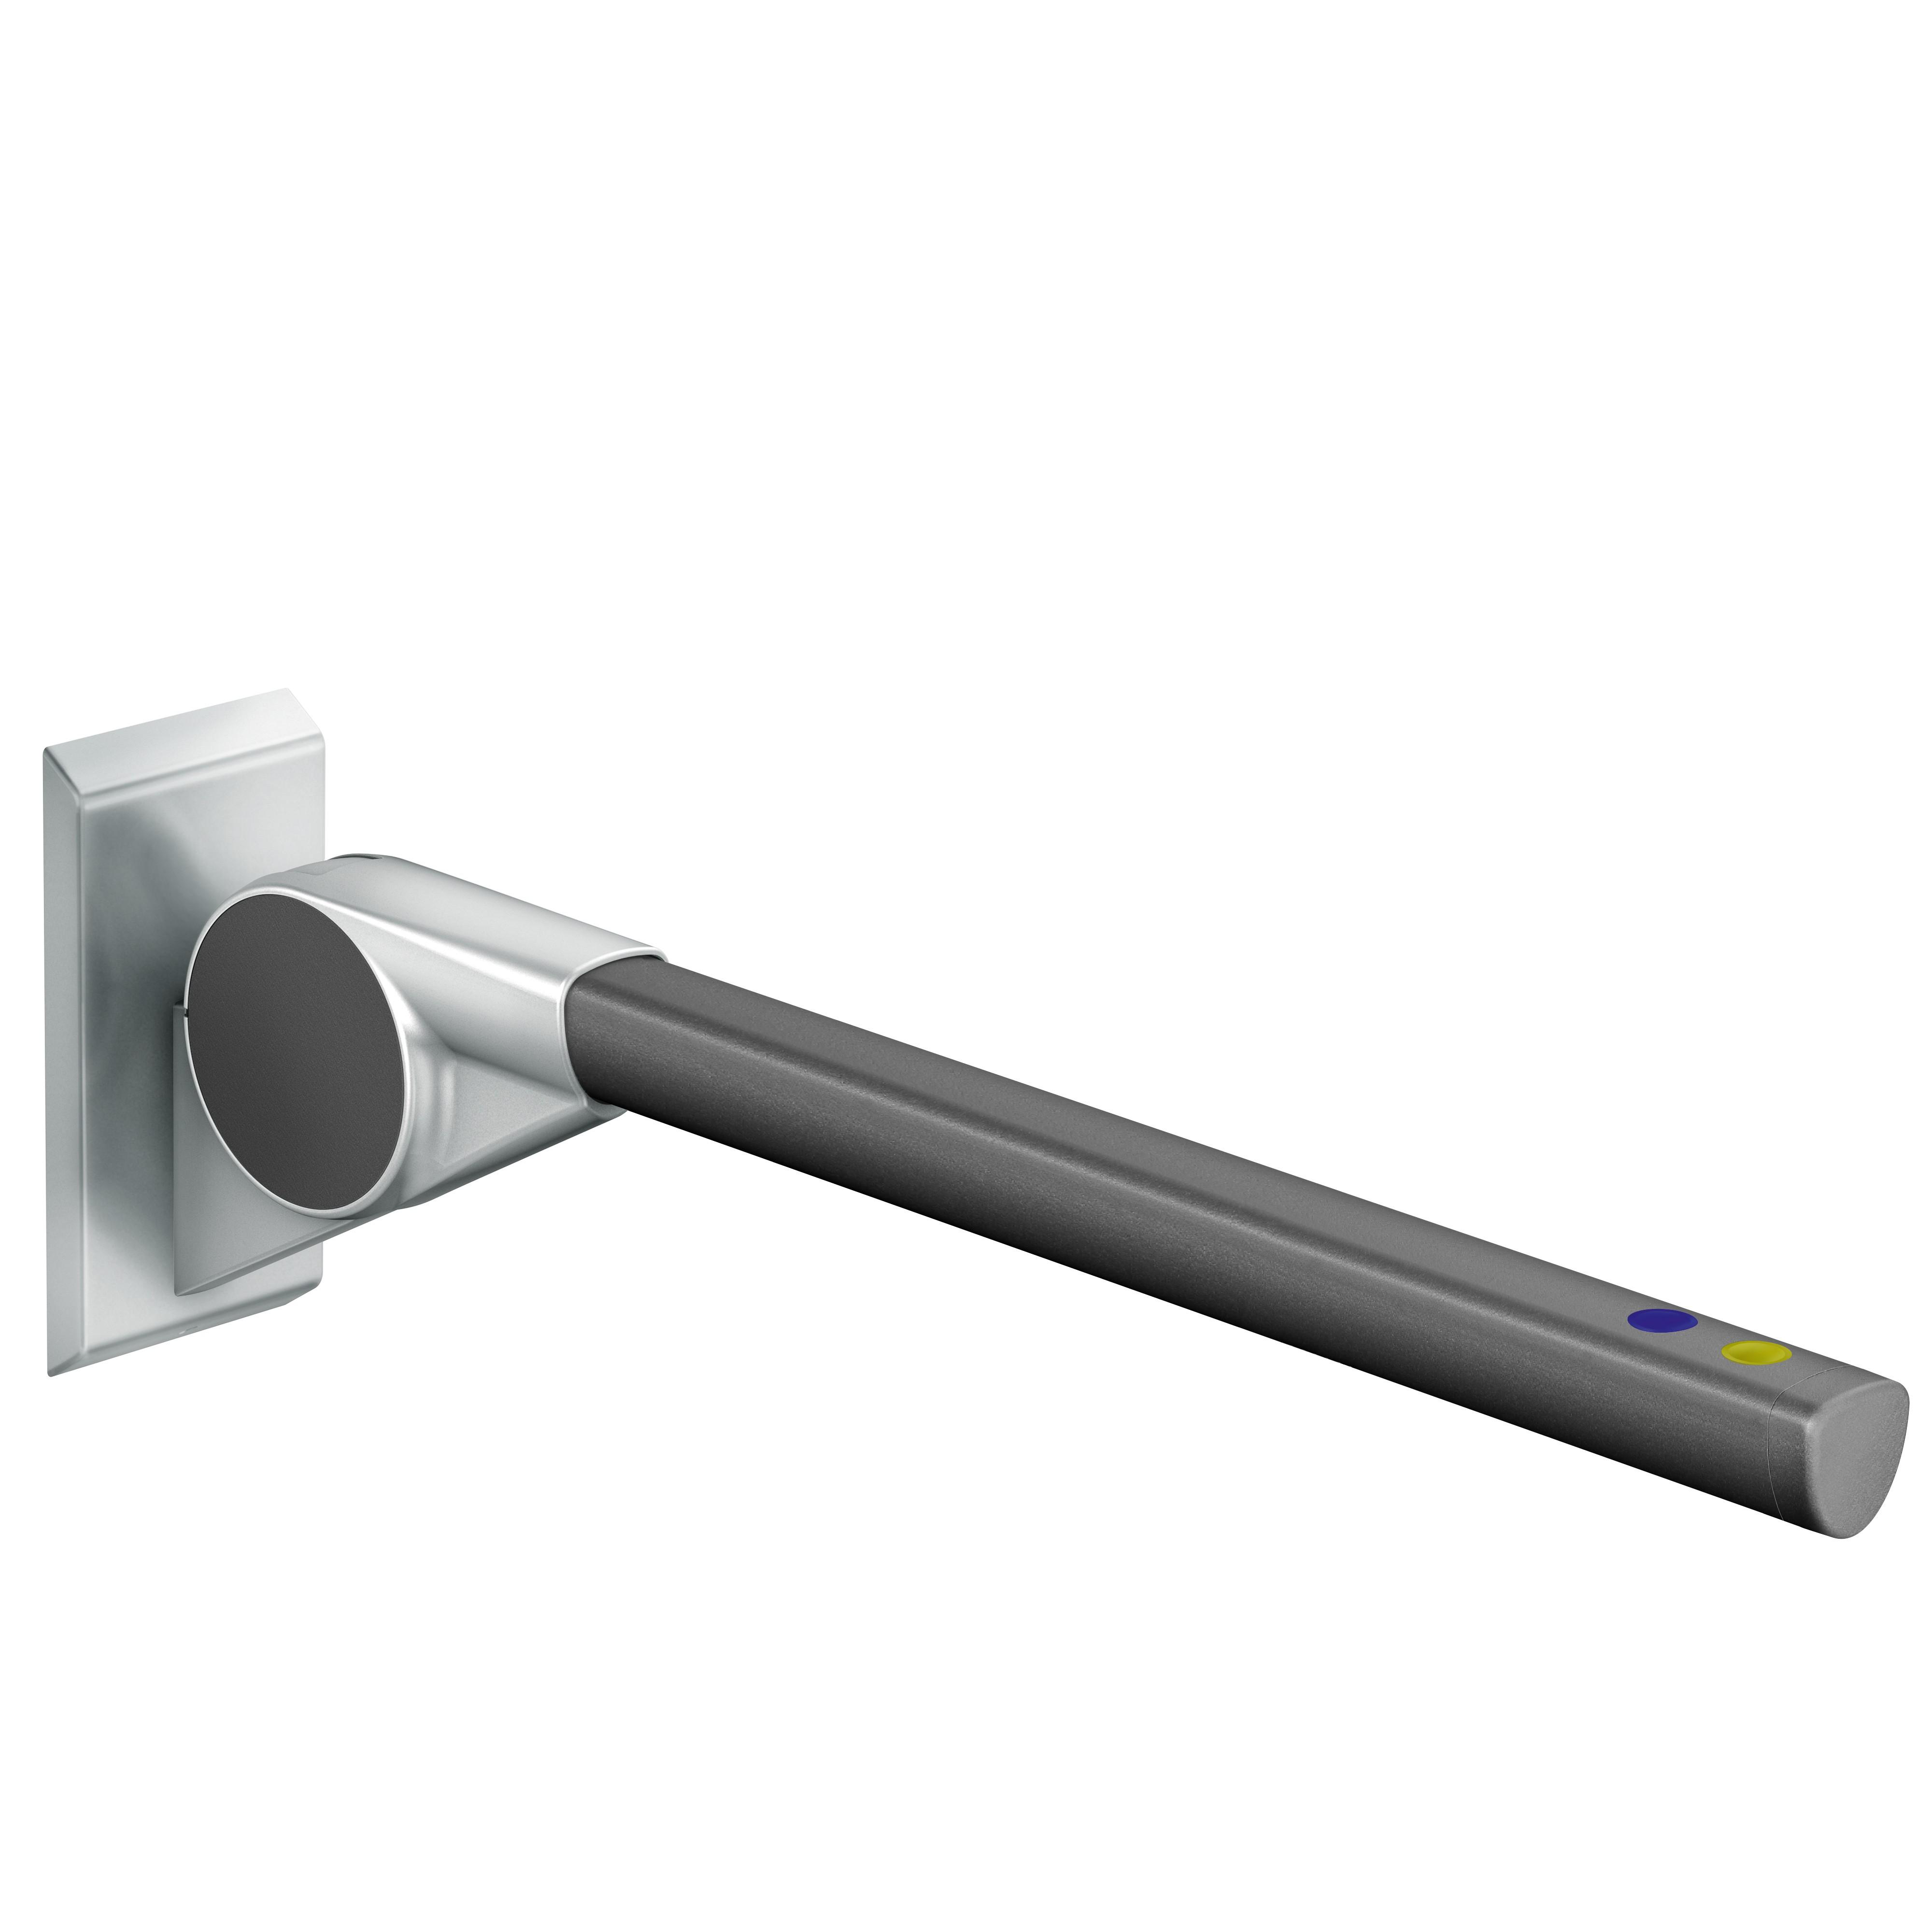 FSB Stützklappgriff 850 2 Taster A100 2 Taster blau/gelb Stützen Aluminiumgrau metallinksc Stange Anthrazitgrau metallinksc(0 82 8420 00485 8811)